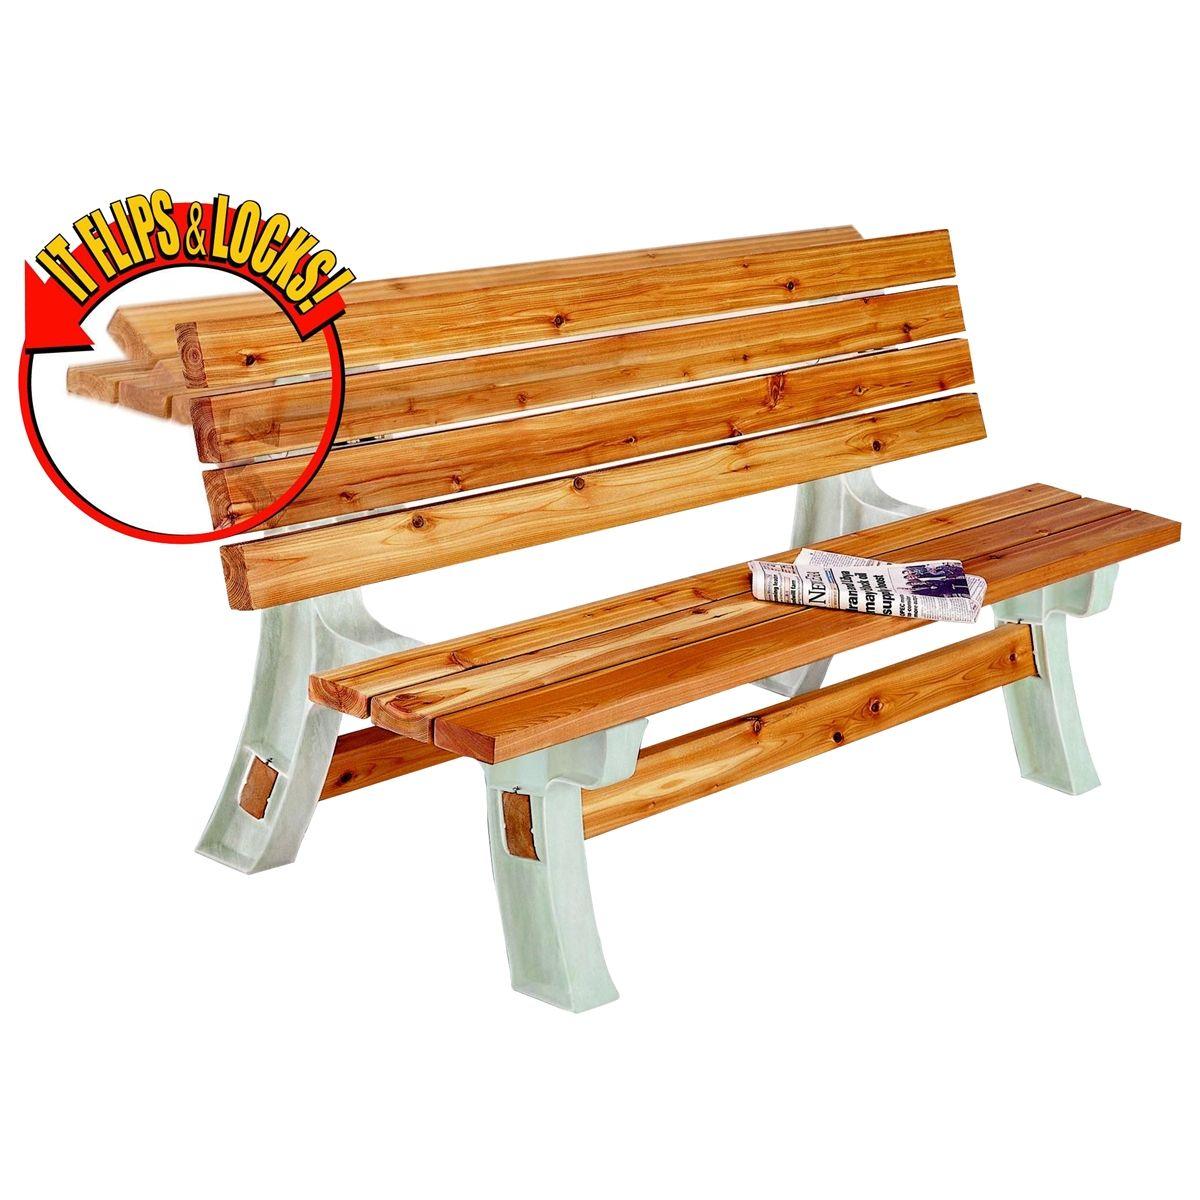 Flip top bench table 28 images 2x4 basics flip top for Flip top picnic table plans